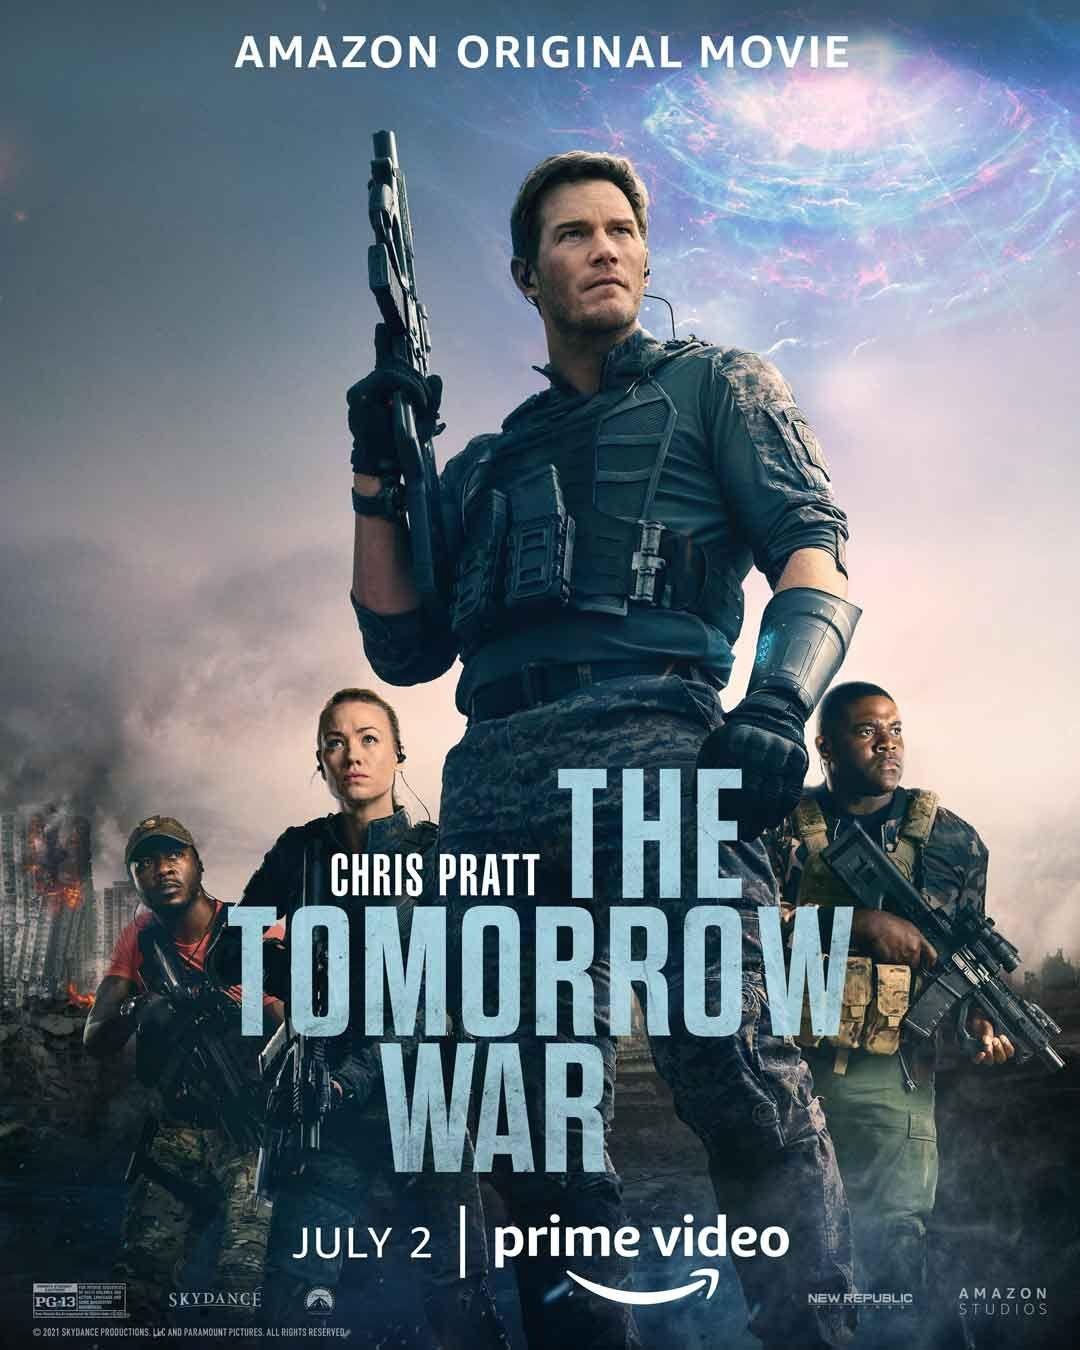 The Tomorrow War (2021) Hindi Dubbed Official Trailer 2 1080p AMZN HDRip Free Download